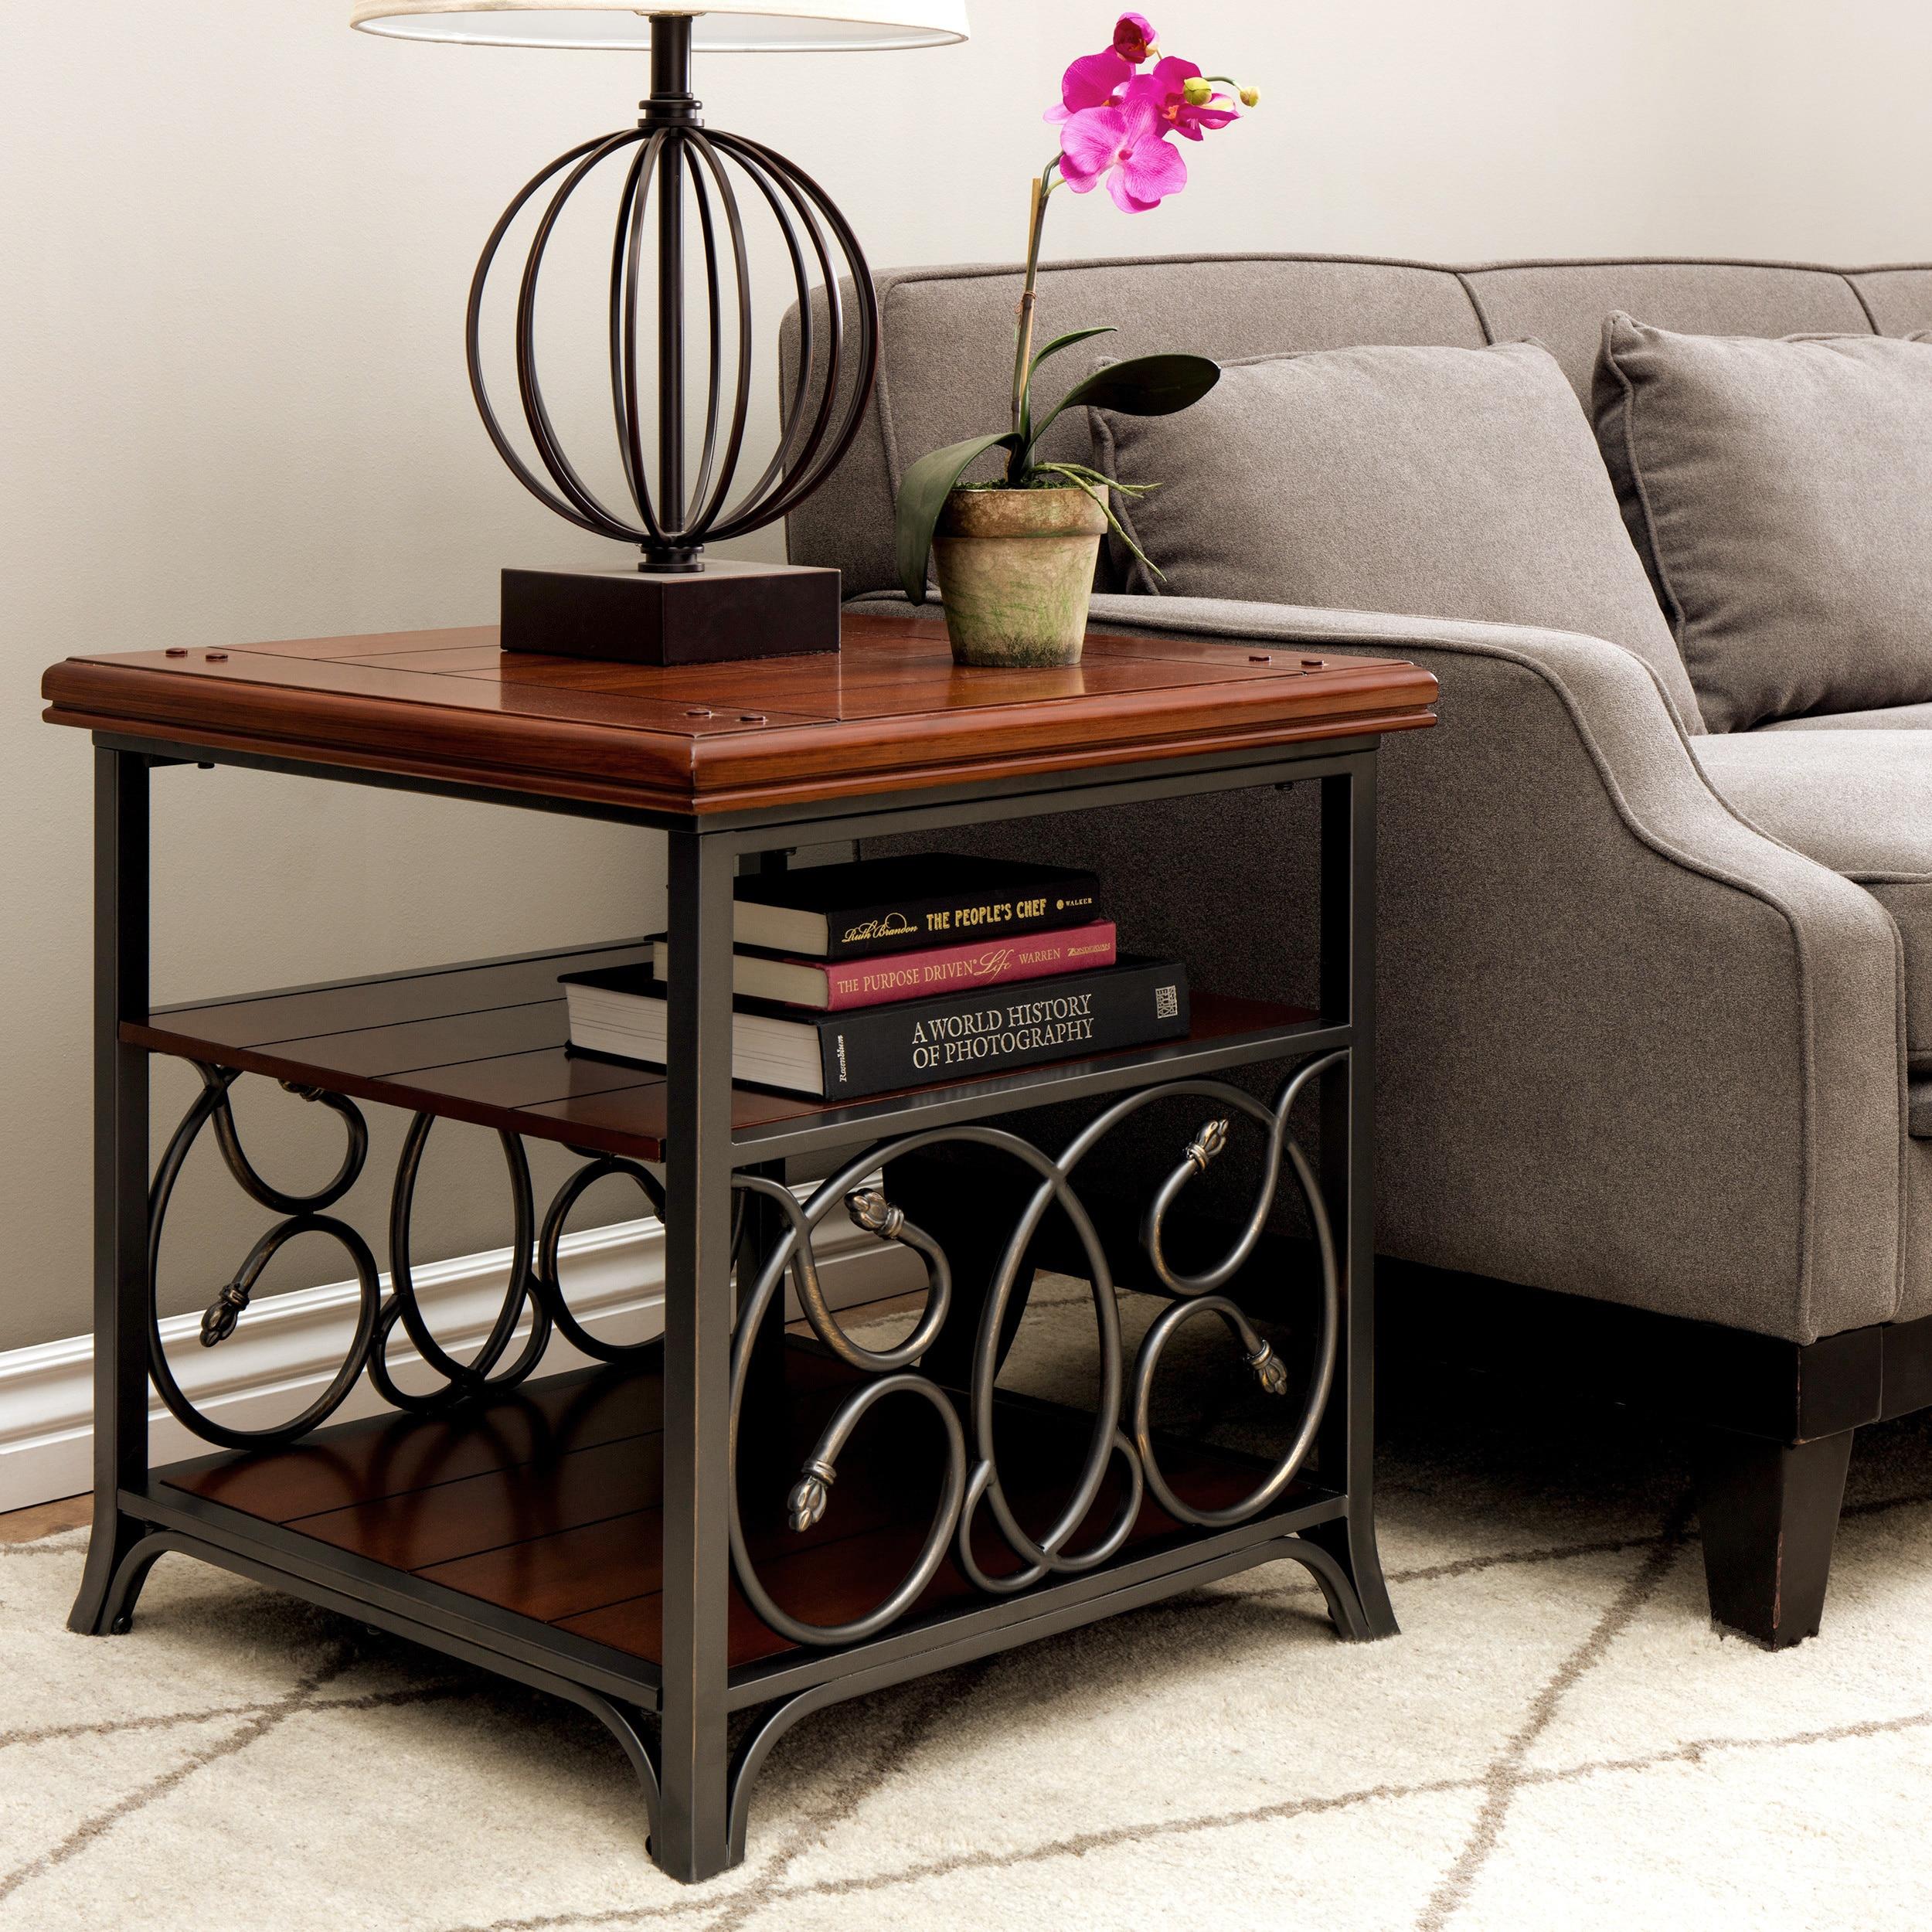 Scrolled Metal and Wood End Table, Brown